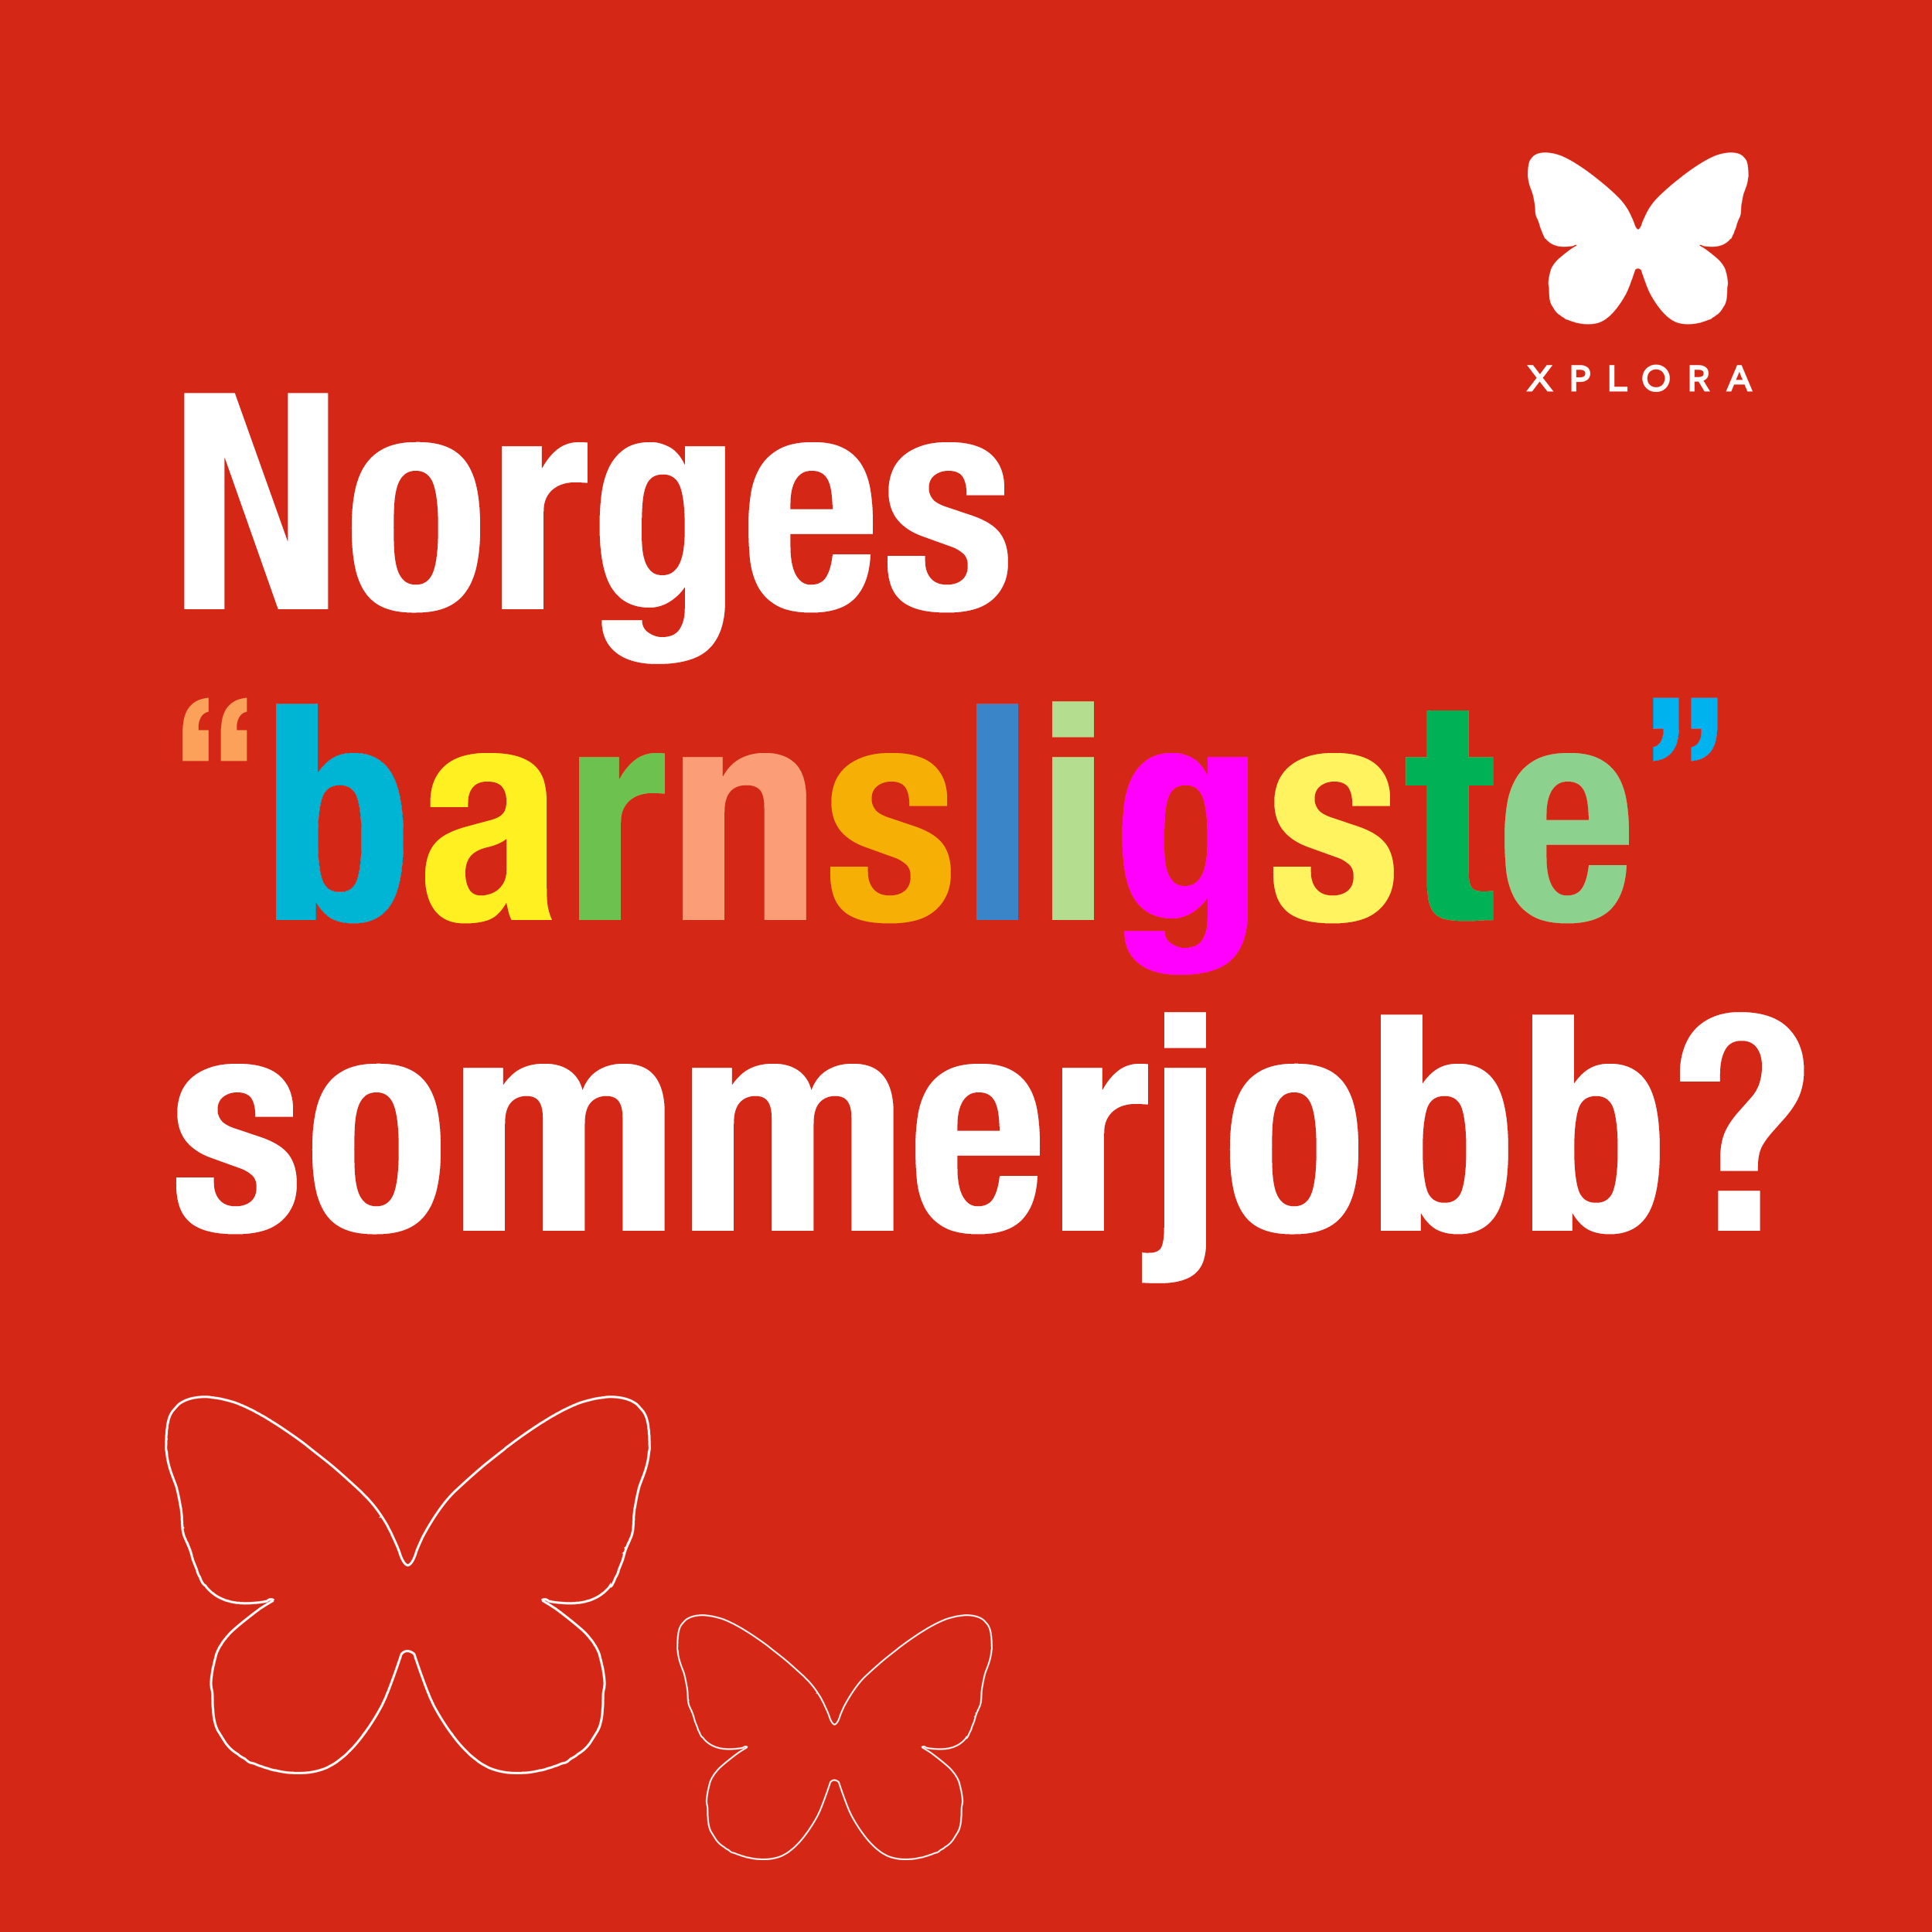 norges-barnsligste-sommerjobb-i-xplora